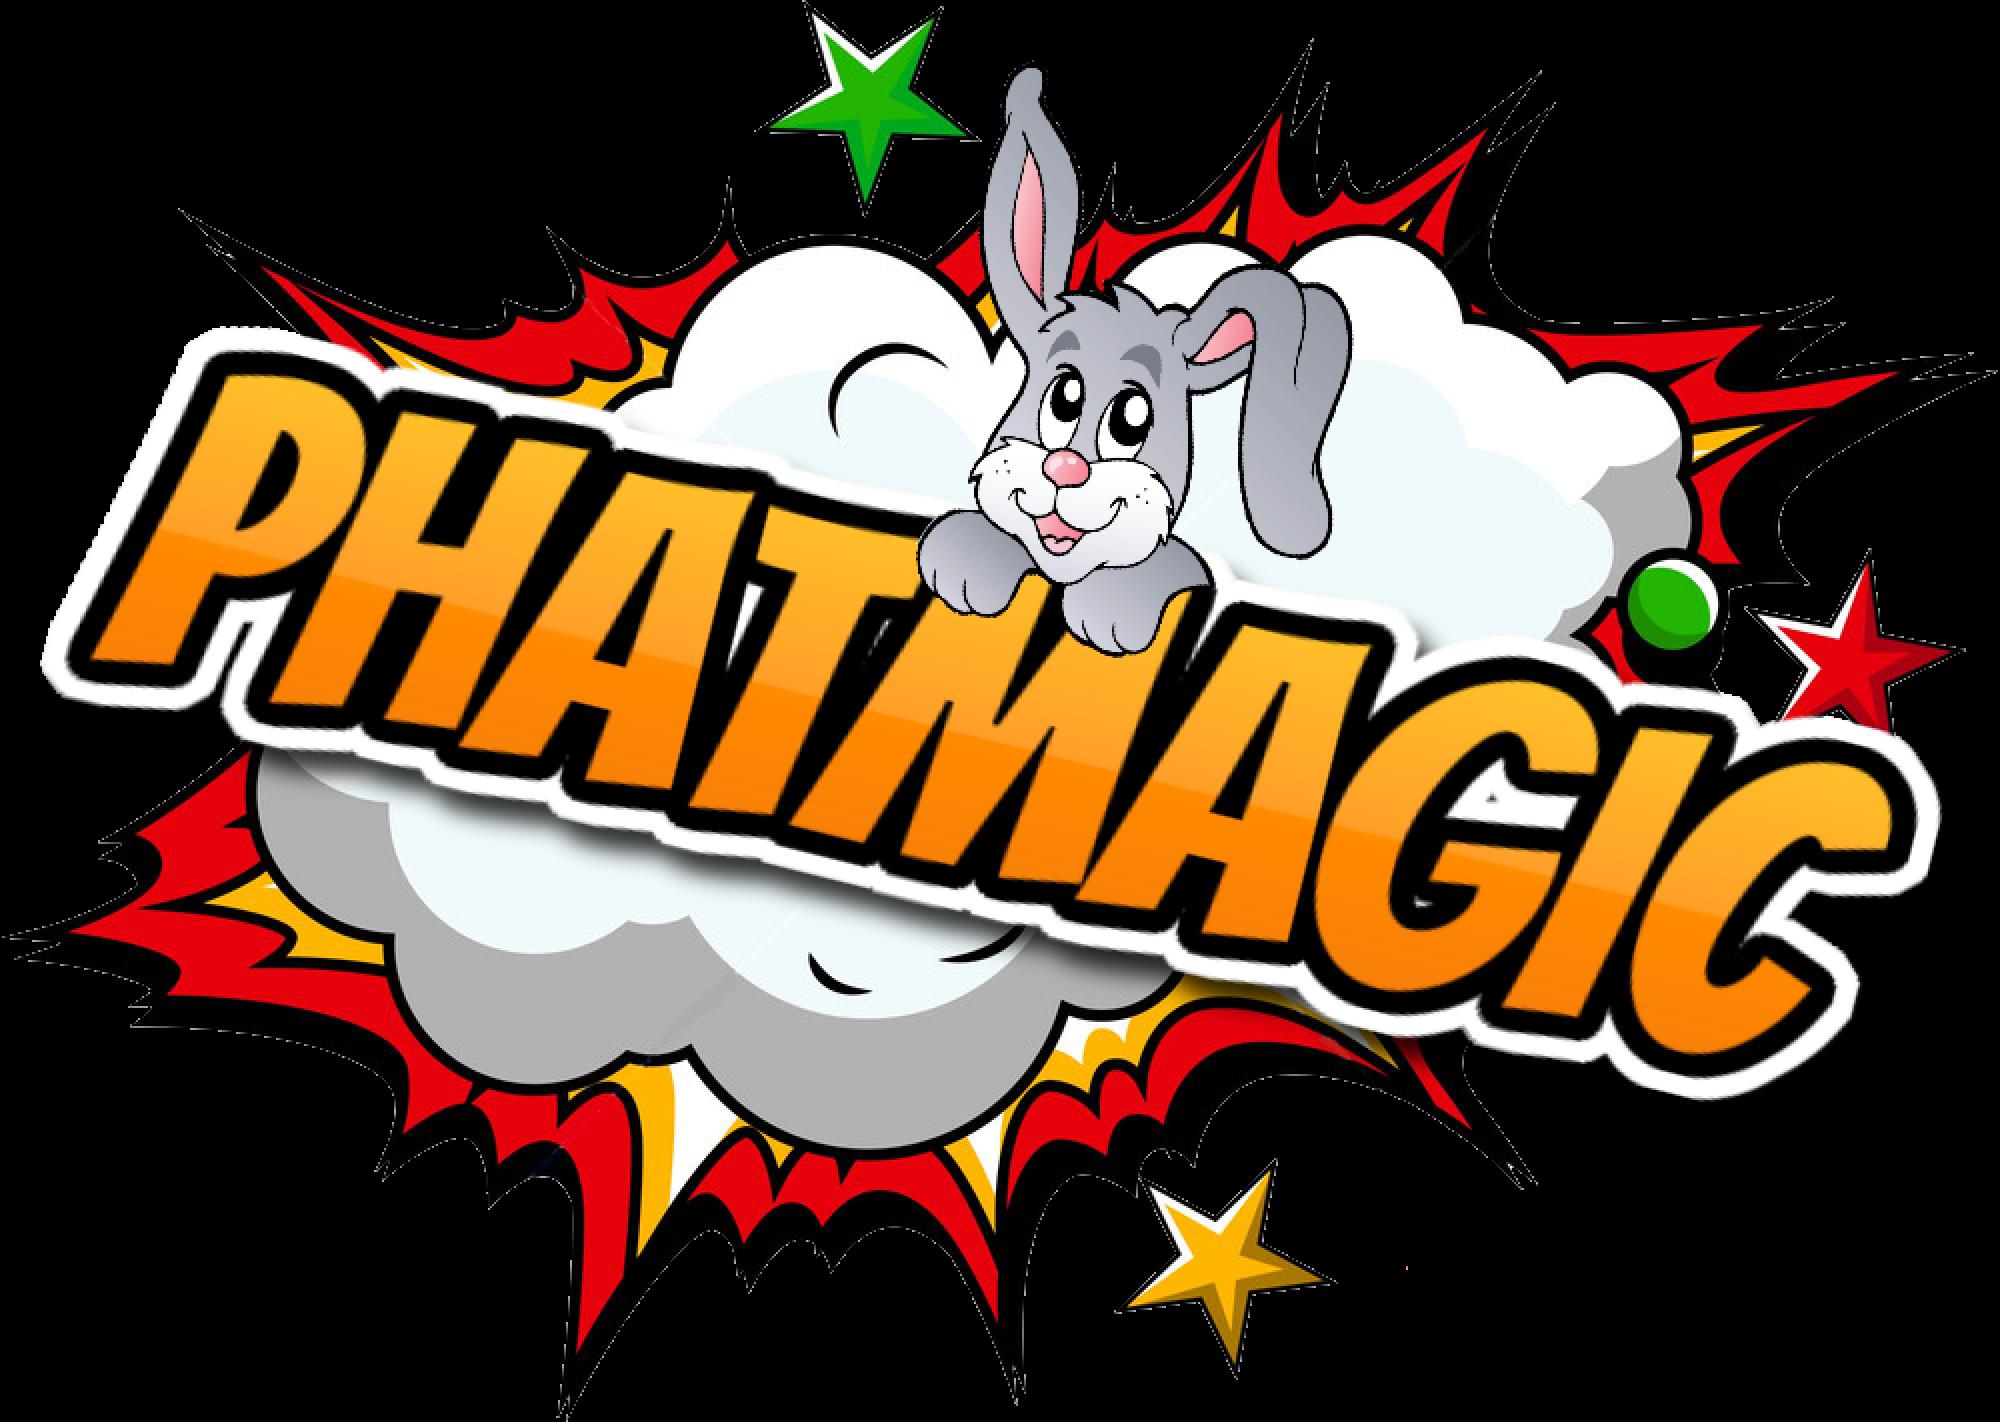 Phatmagic